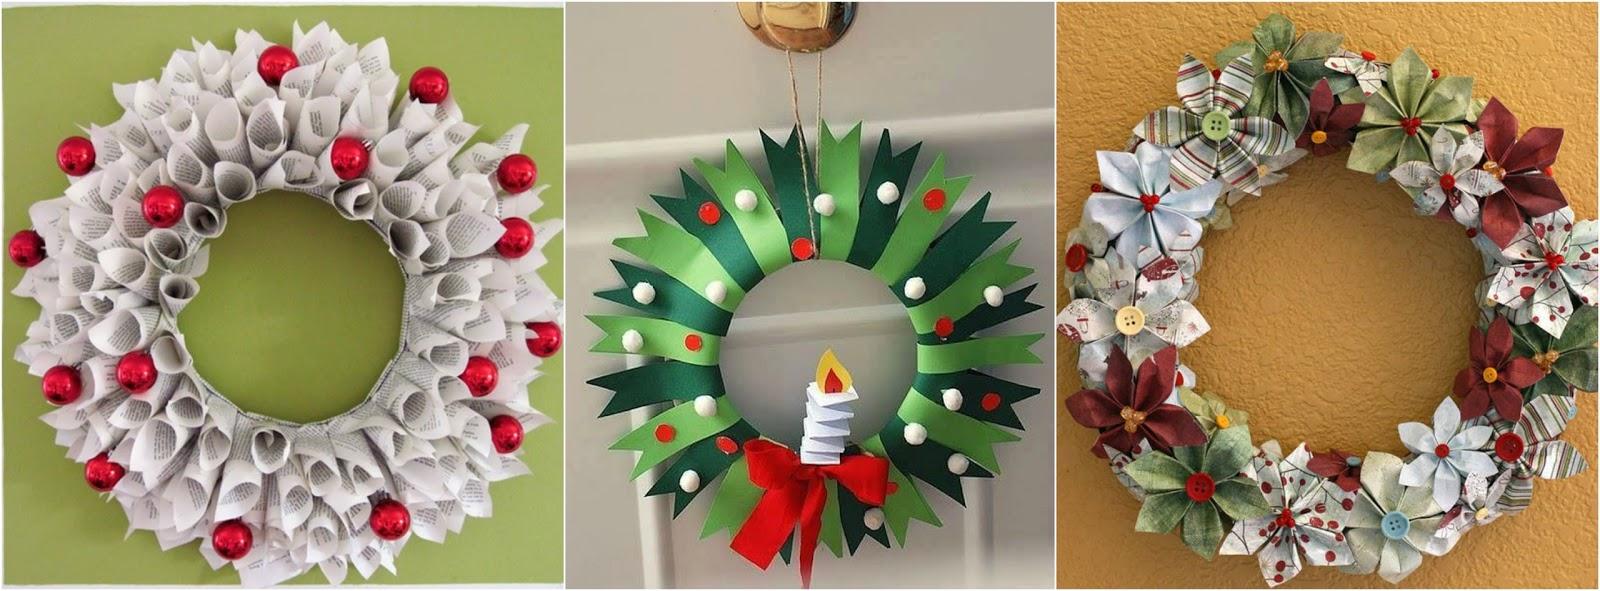 Tutorial aprende c mo hacer bonitas coronas navide as de papel mimundomanual - Como hacer coronas navidenas ...